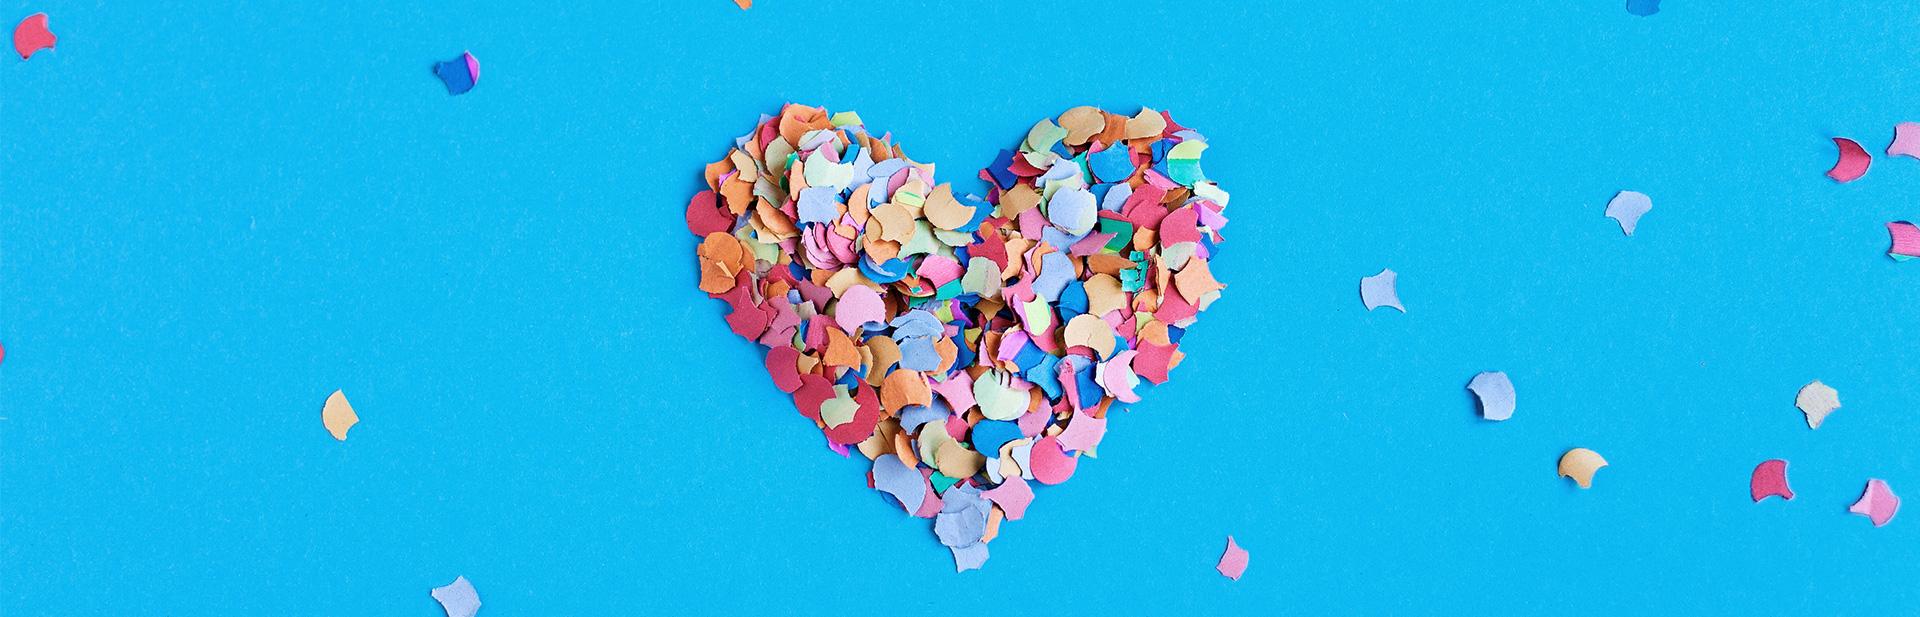 Herz aus buntem Konfetti